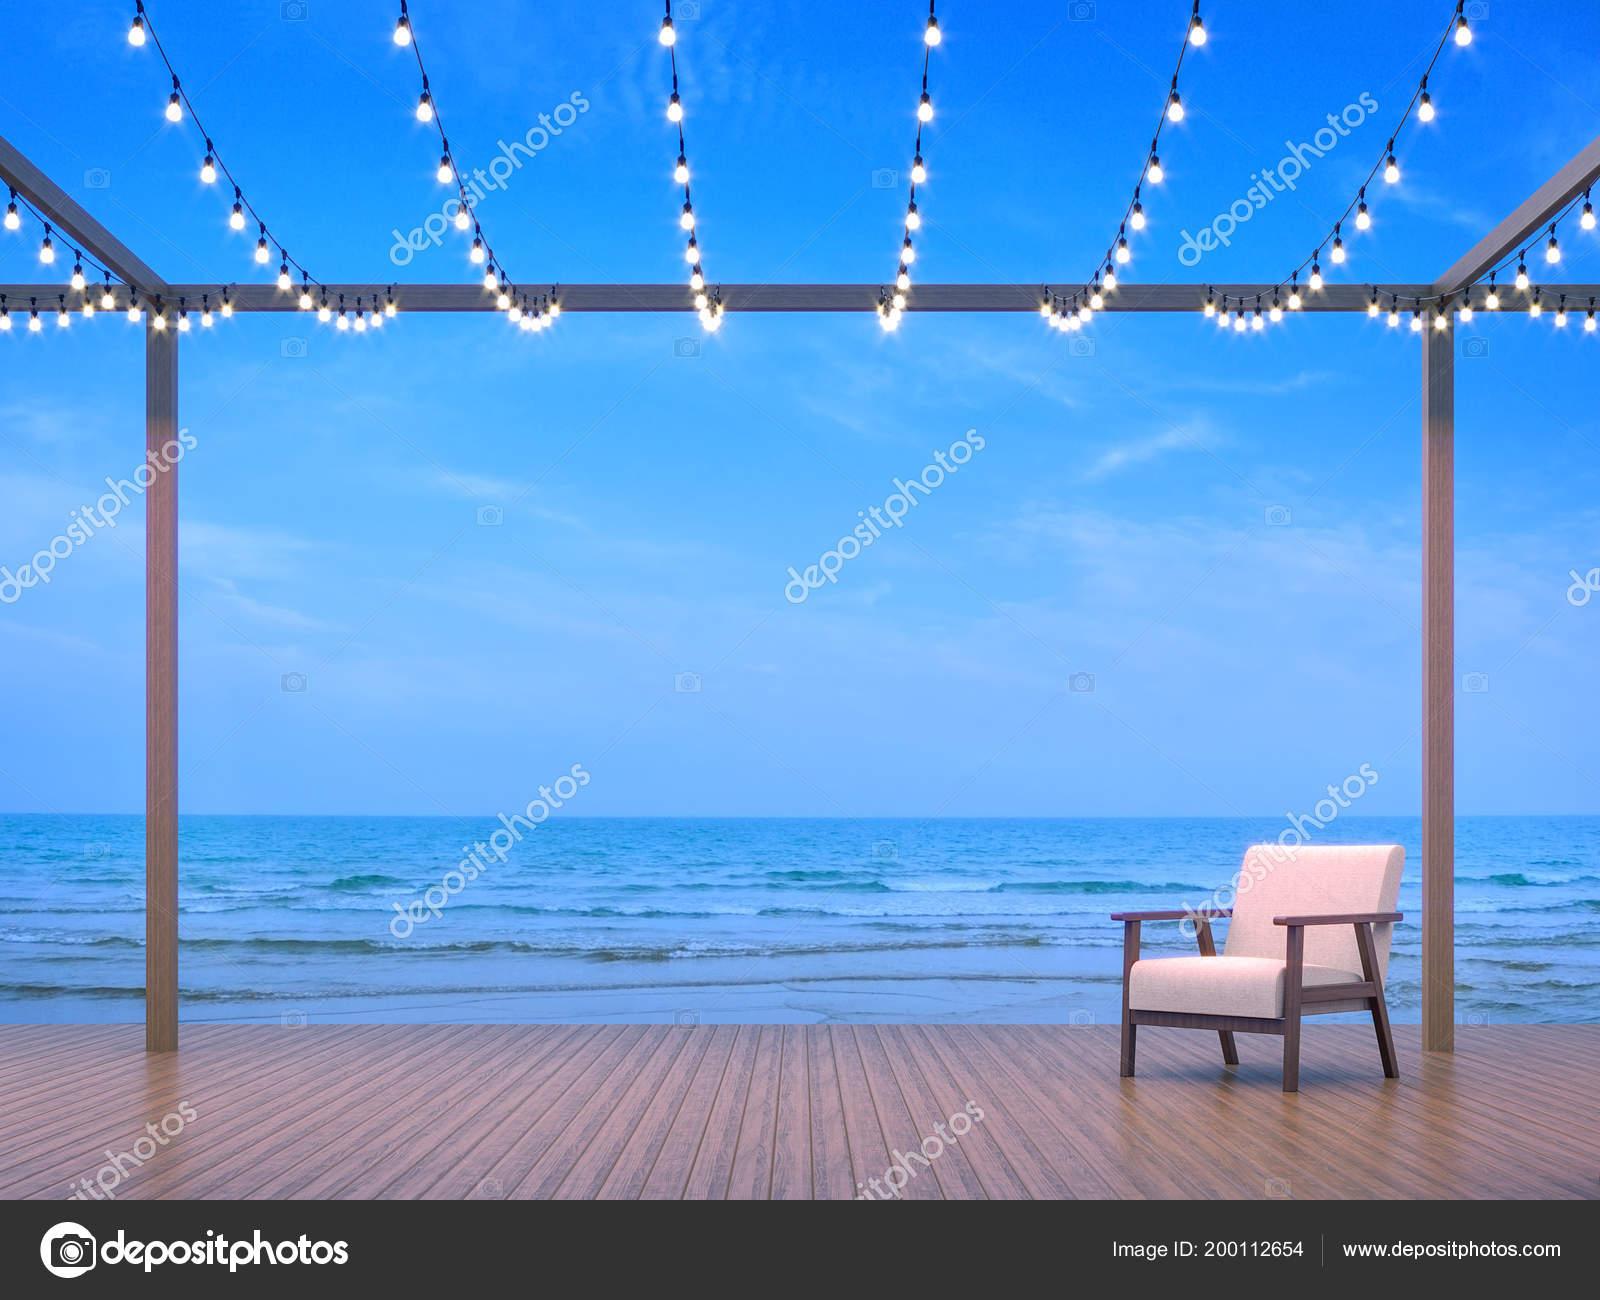 Seaside Terrace Render Wooden Floor Decorate String Light